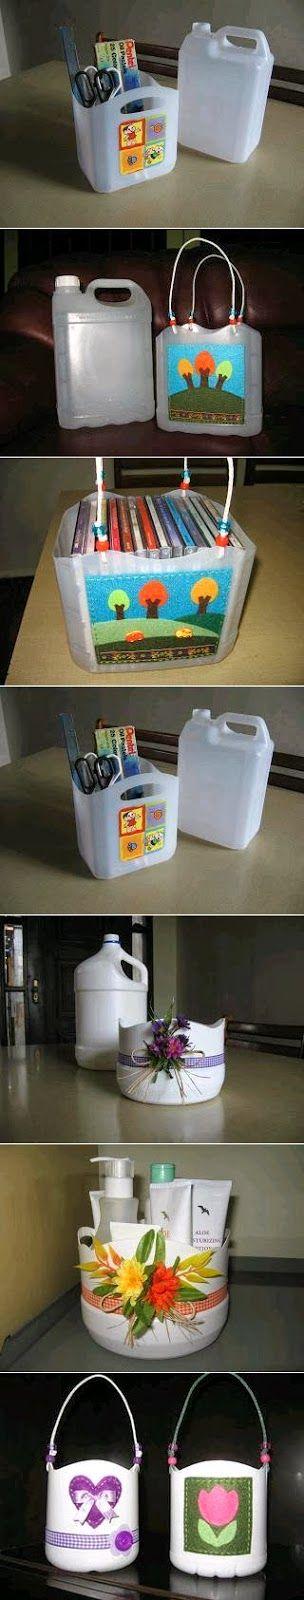 garrafas recicladas: